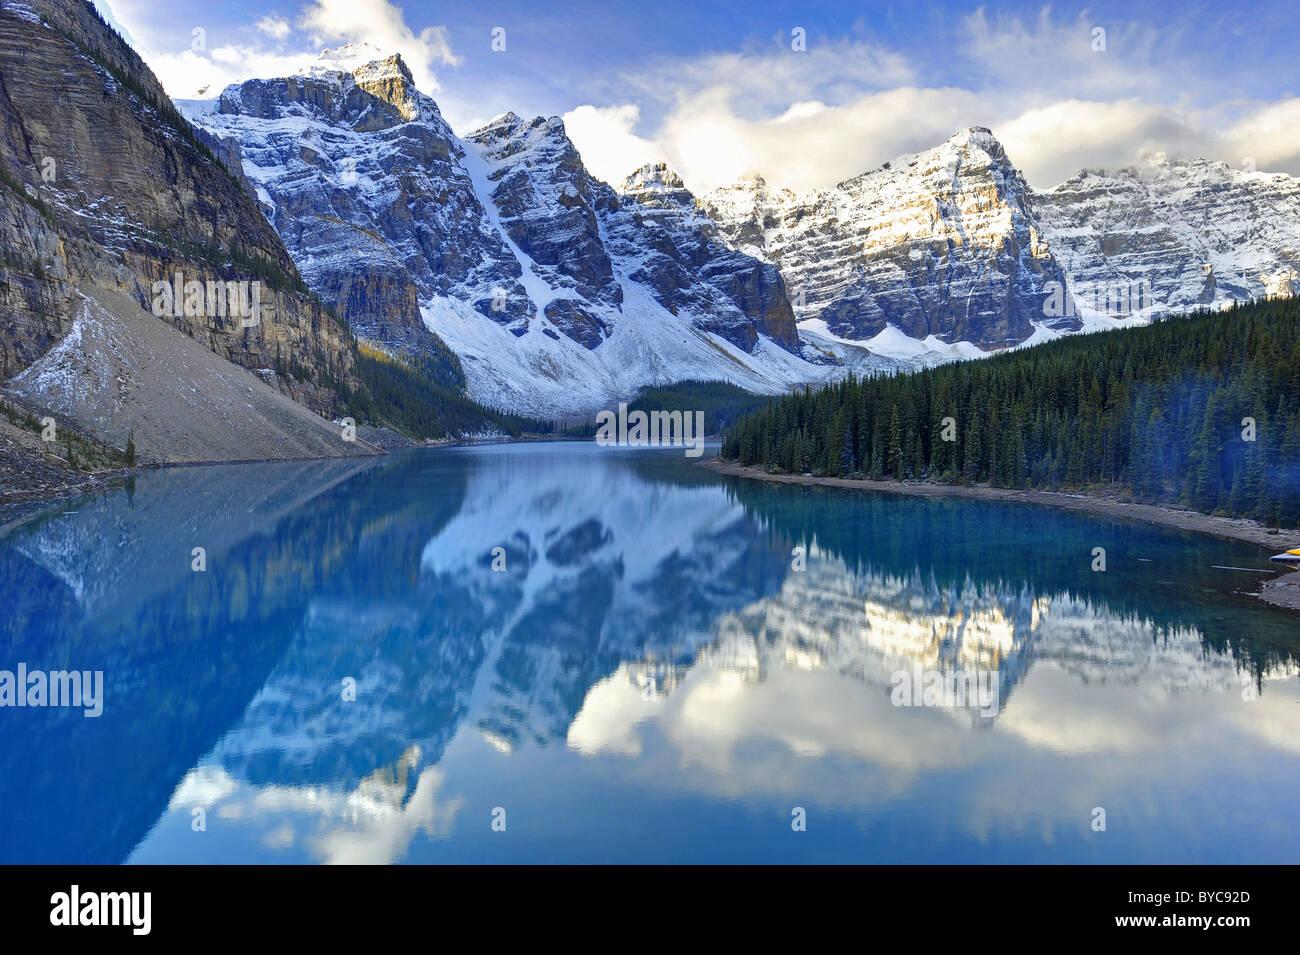 Morraine Lake, Alberta, Canada Stock Photo